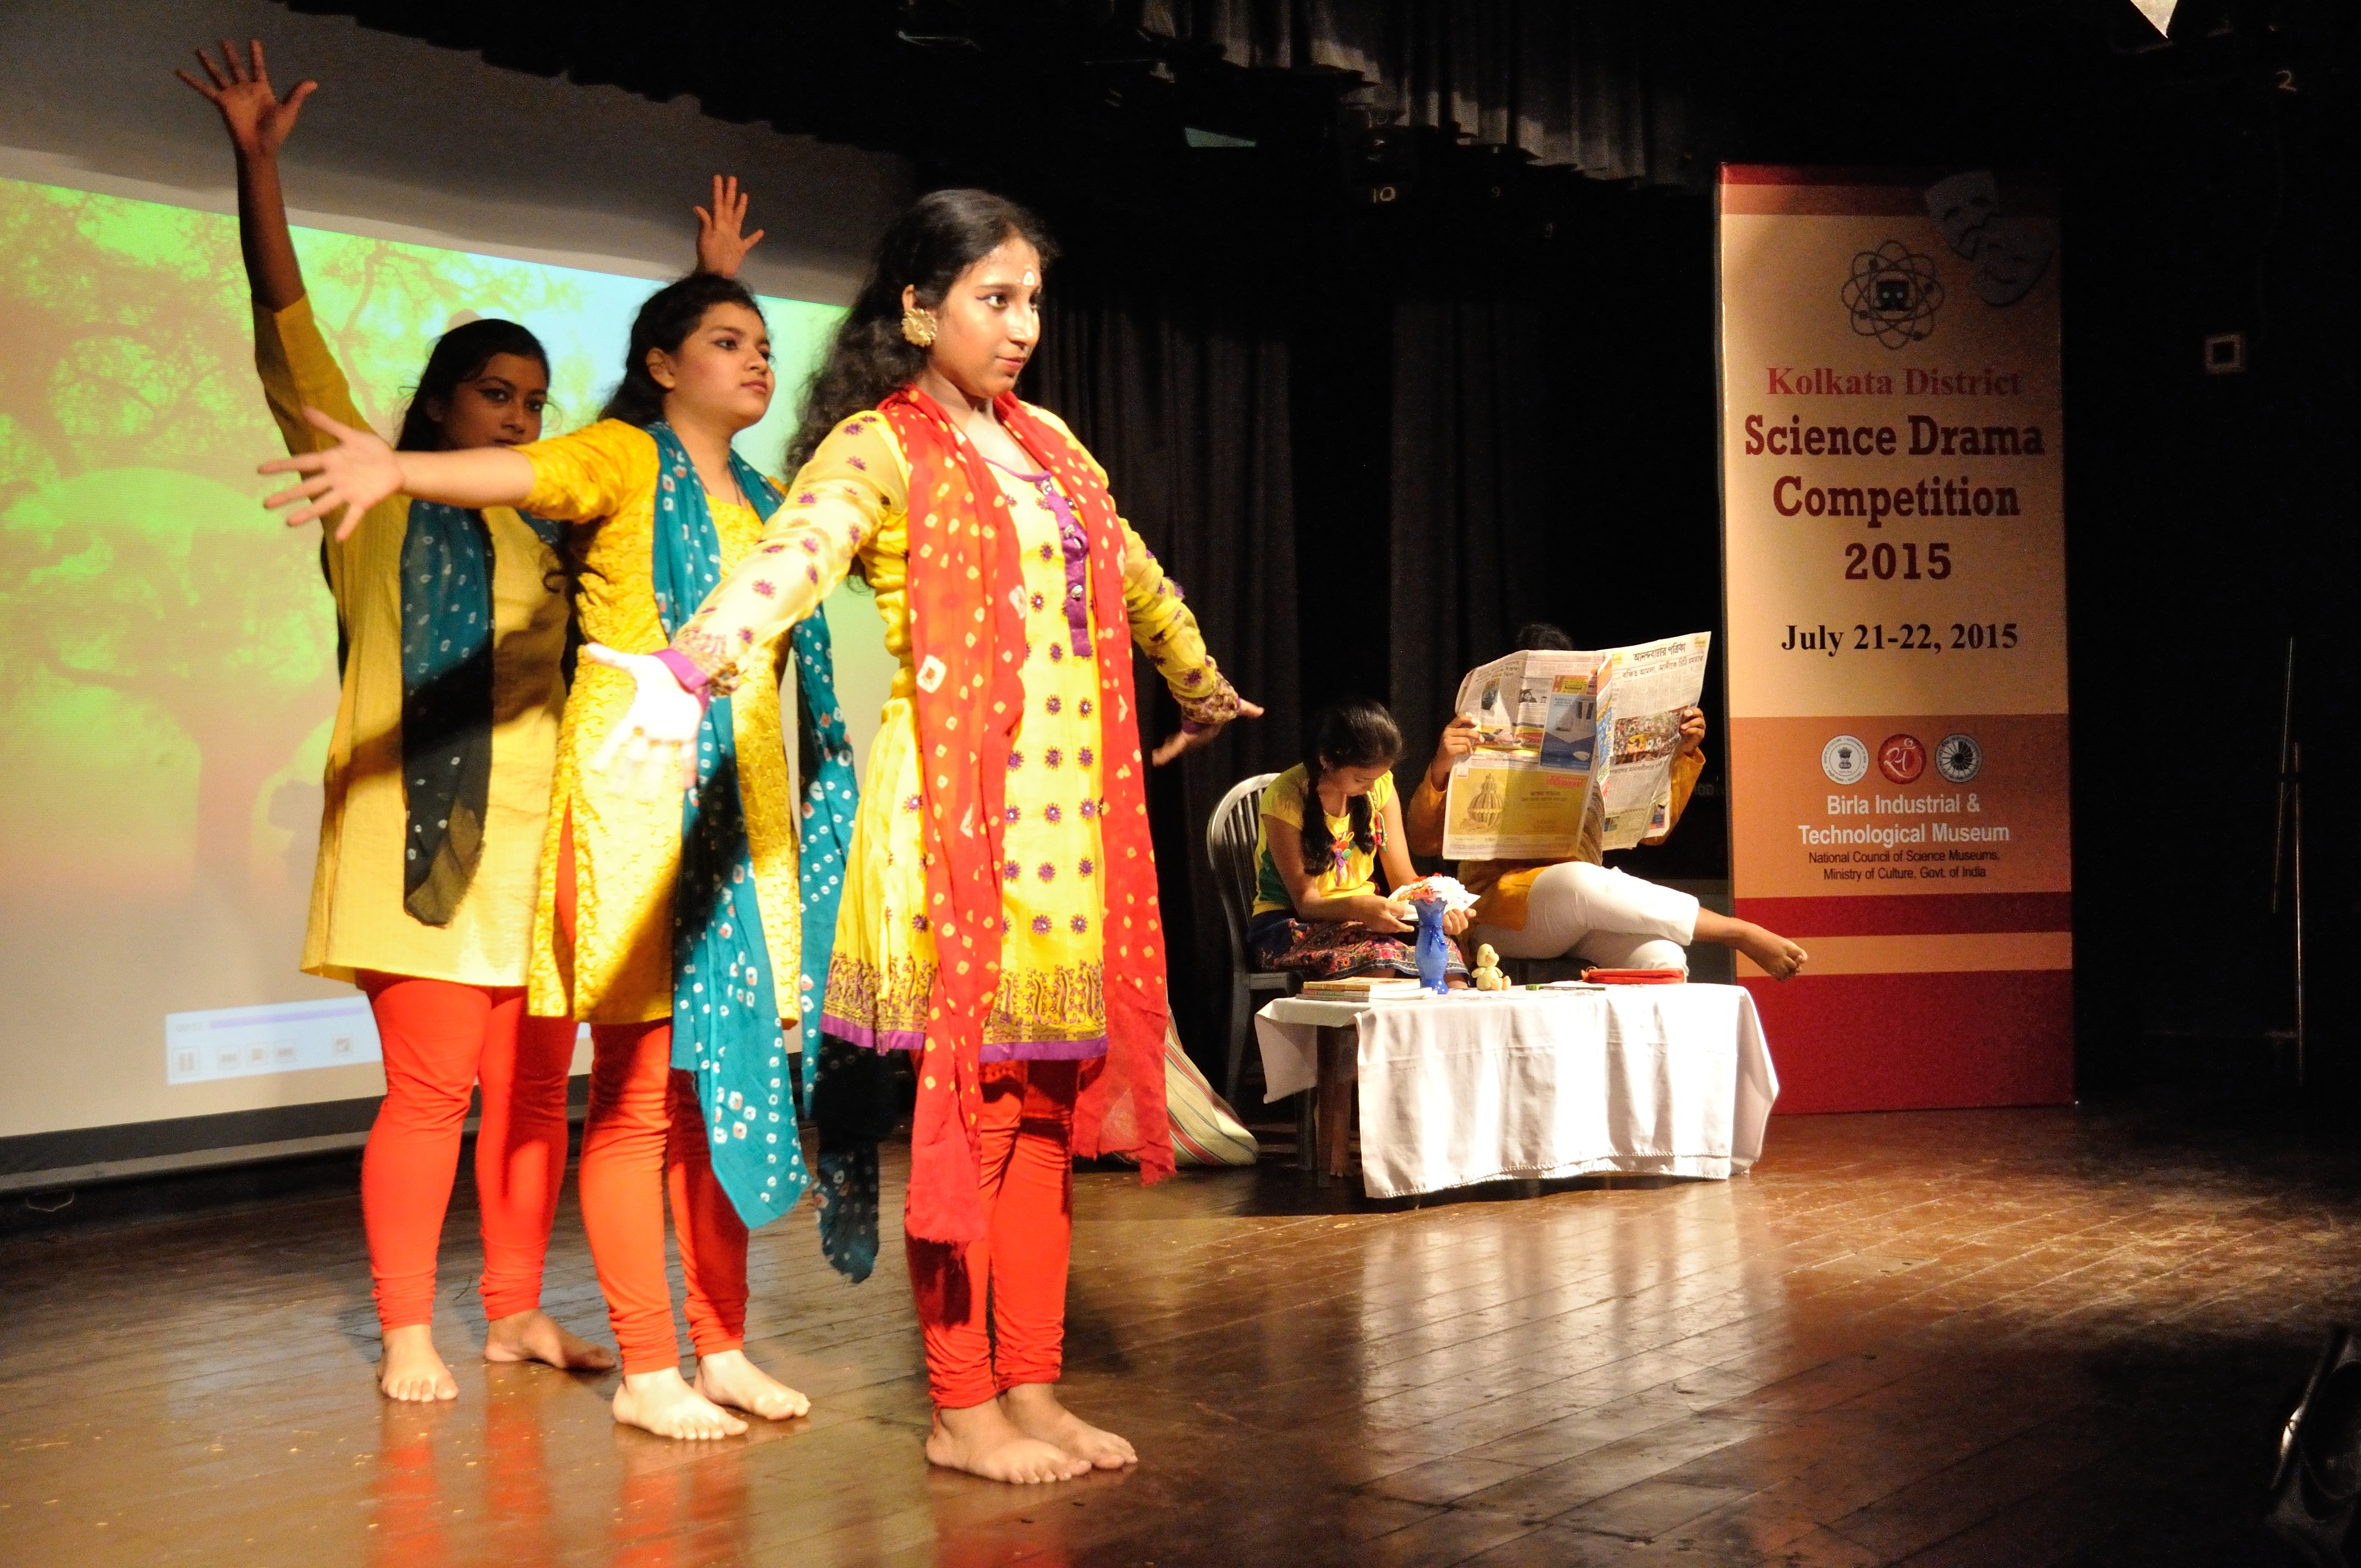 File:Alo O Jiban - Science Drama - Silver Point School - BITM - Kolkata